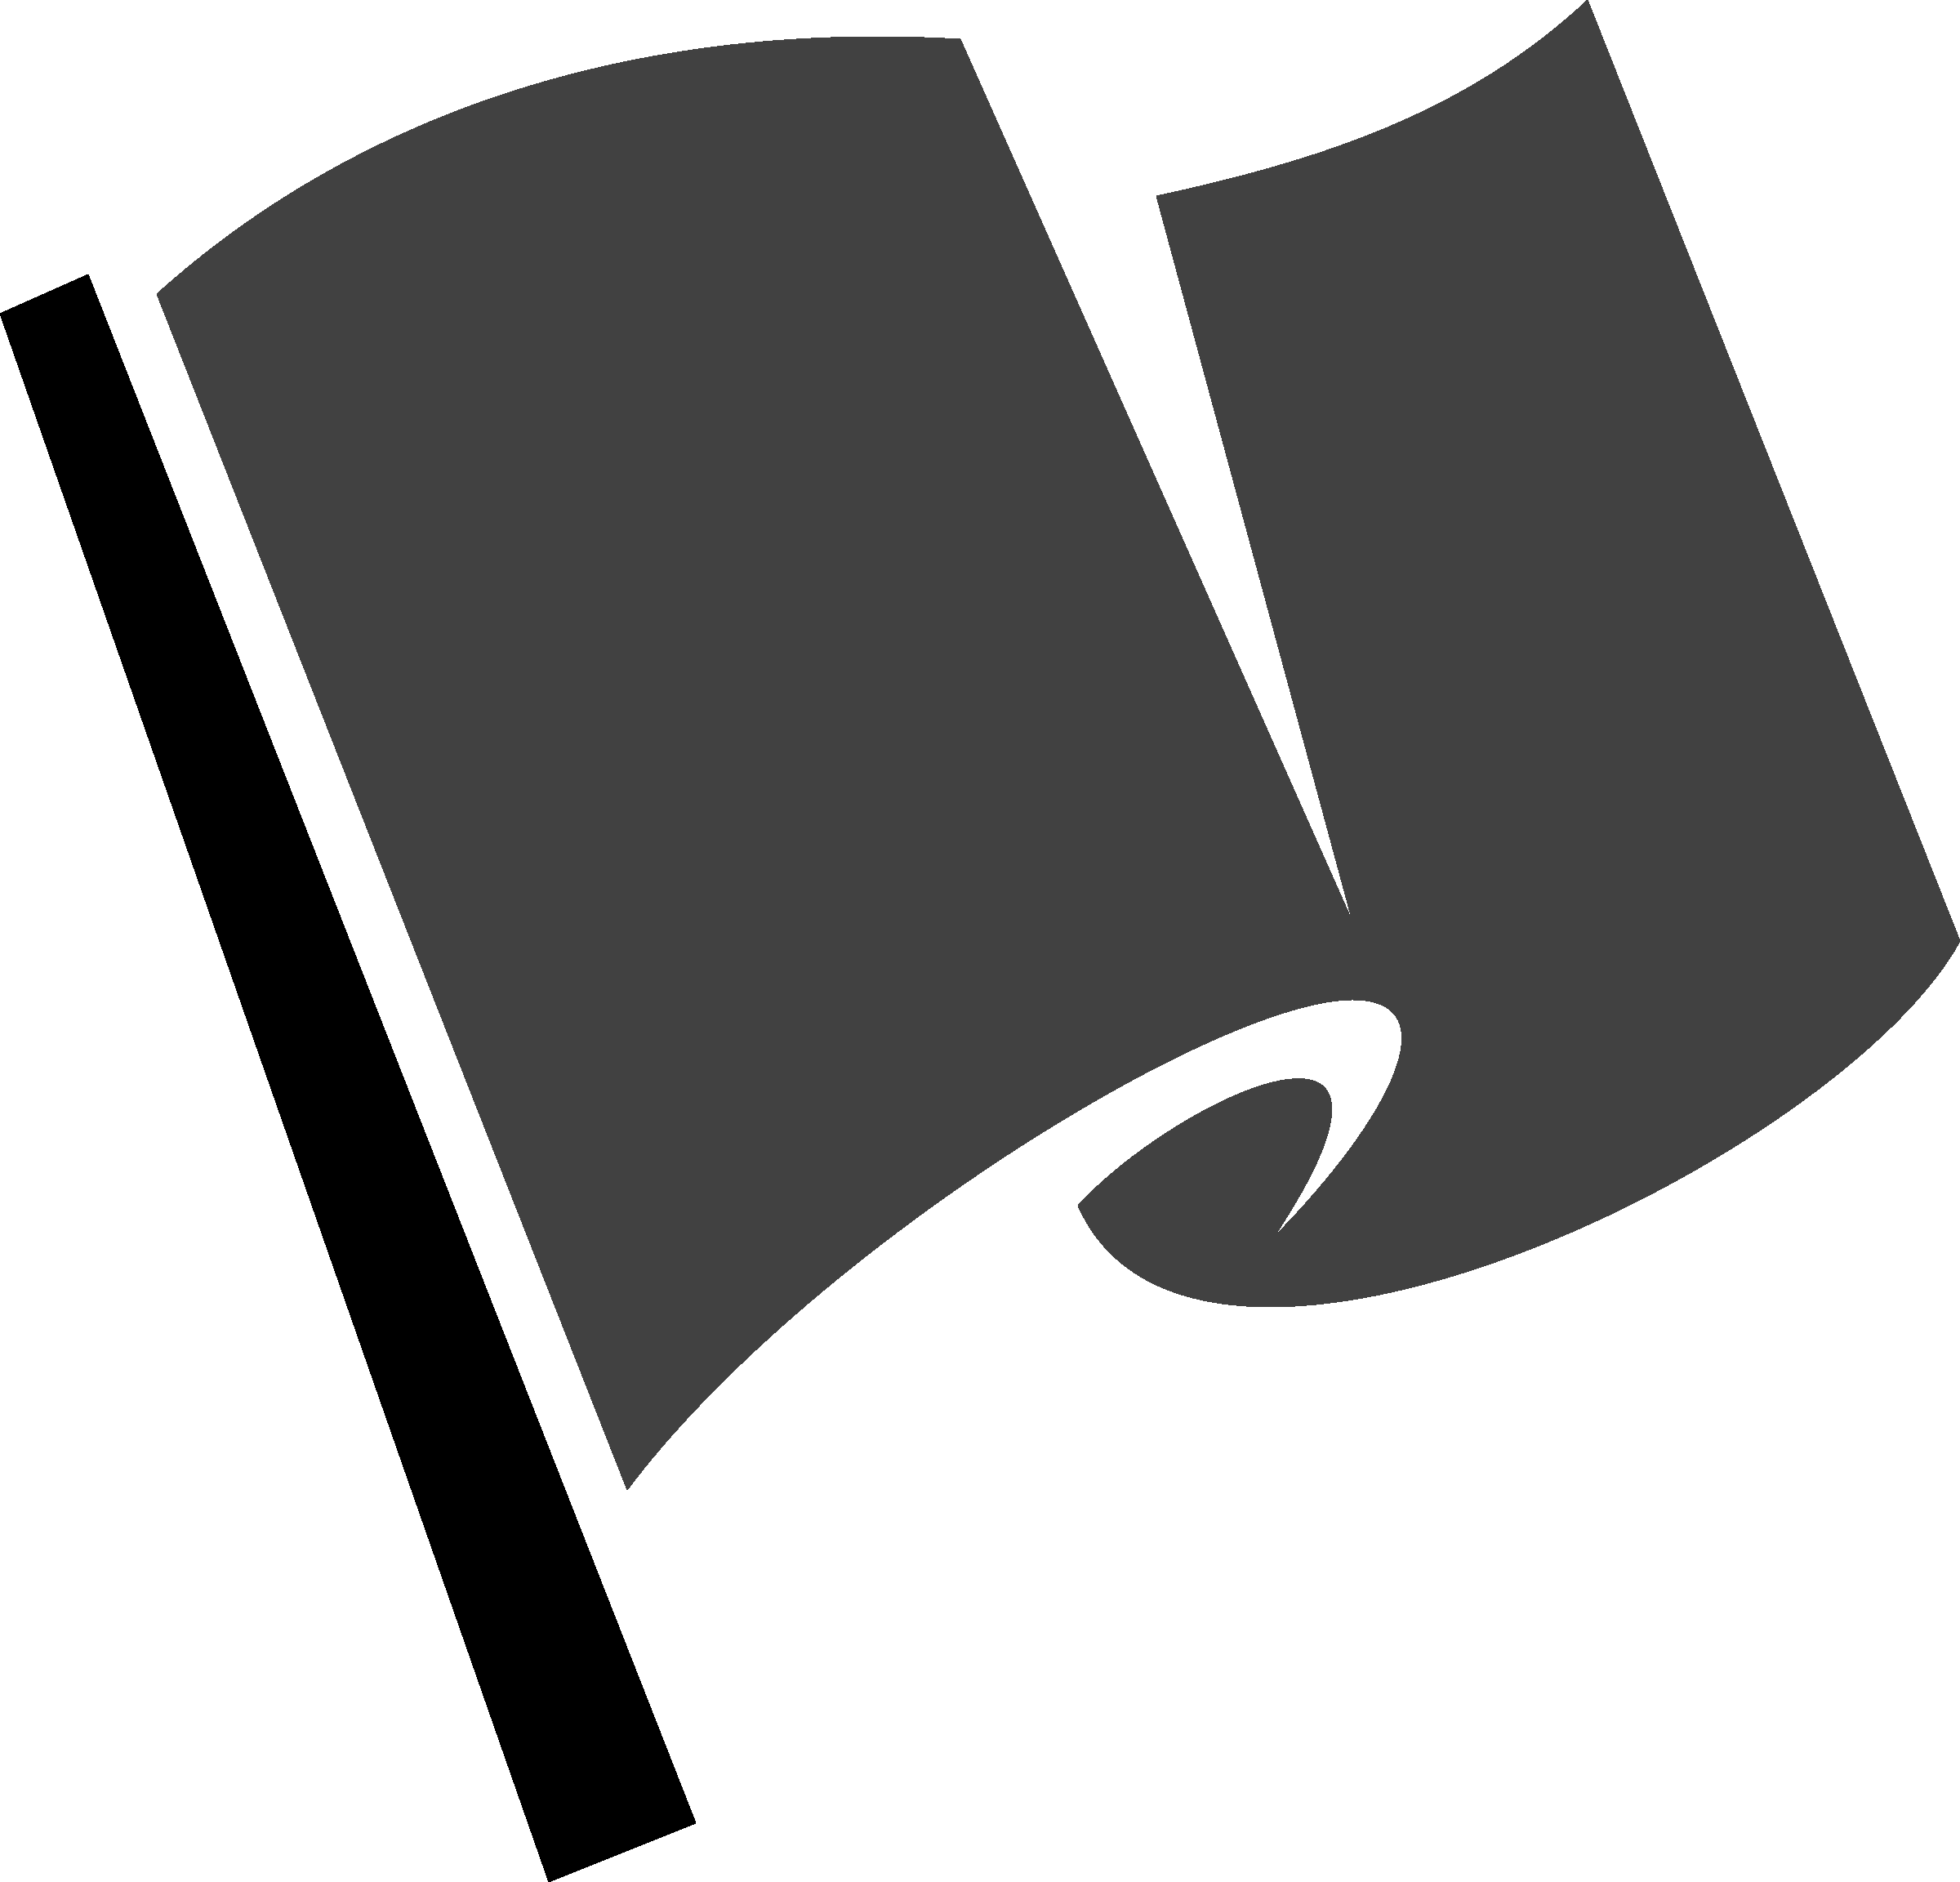 BIG IMAGE (PNG) - Flag Logo PNG